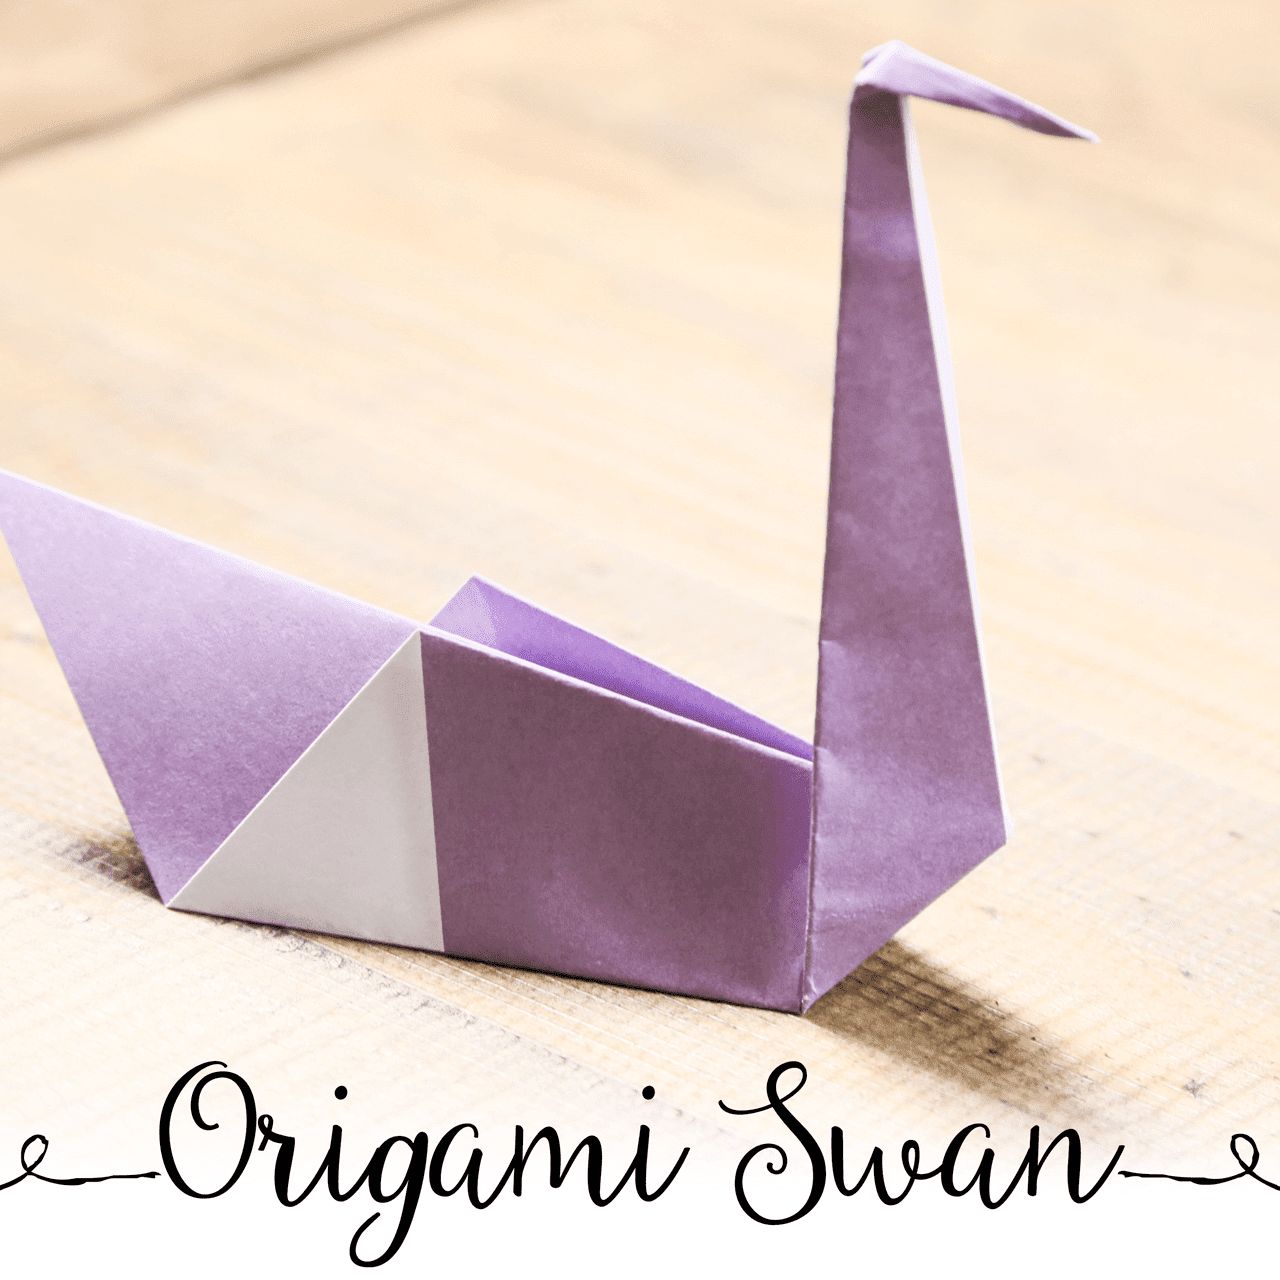 Origami Napkin Folding Swan - YouTube   1280x1280